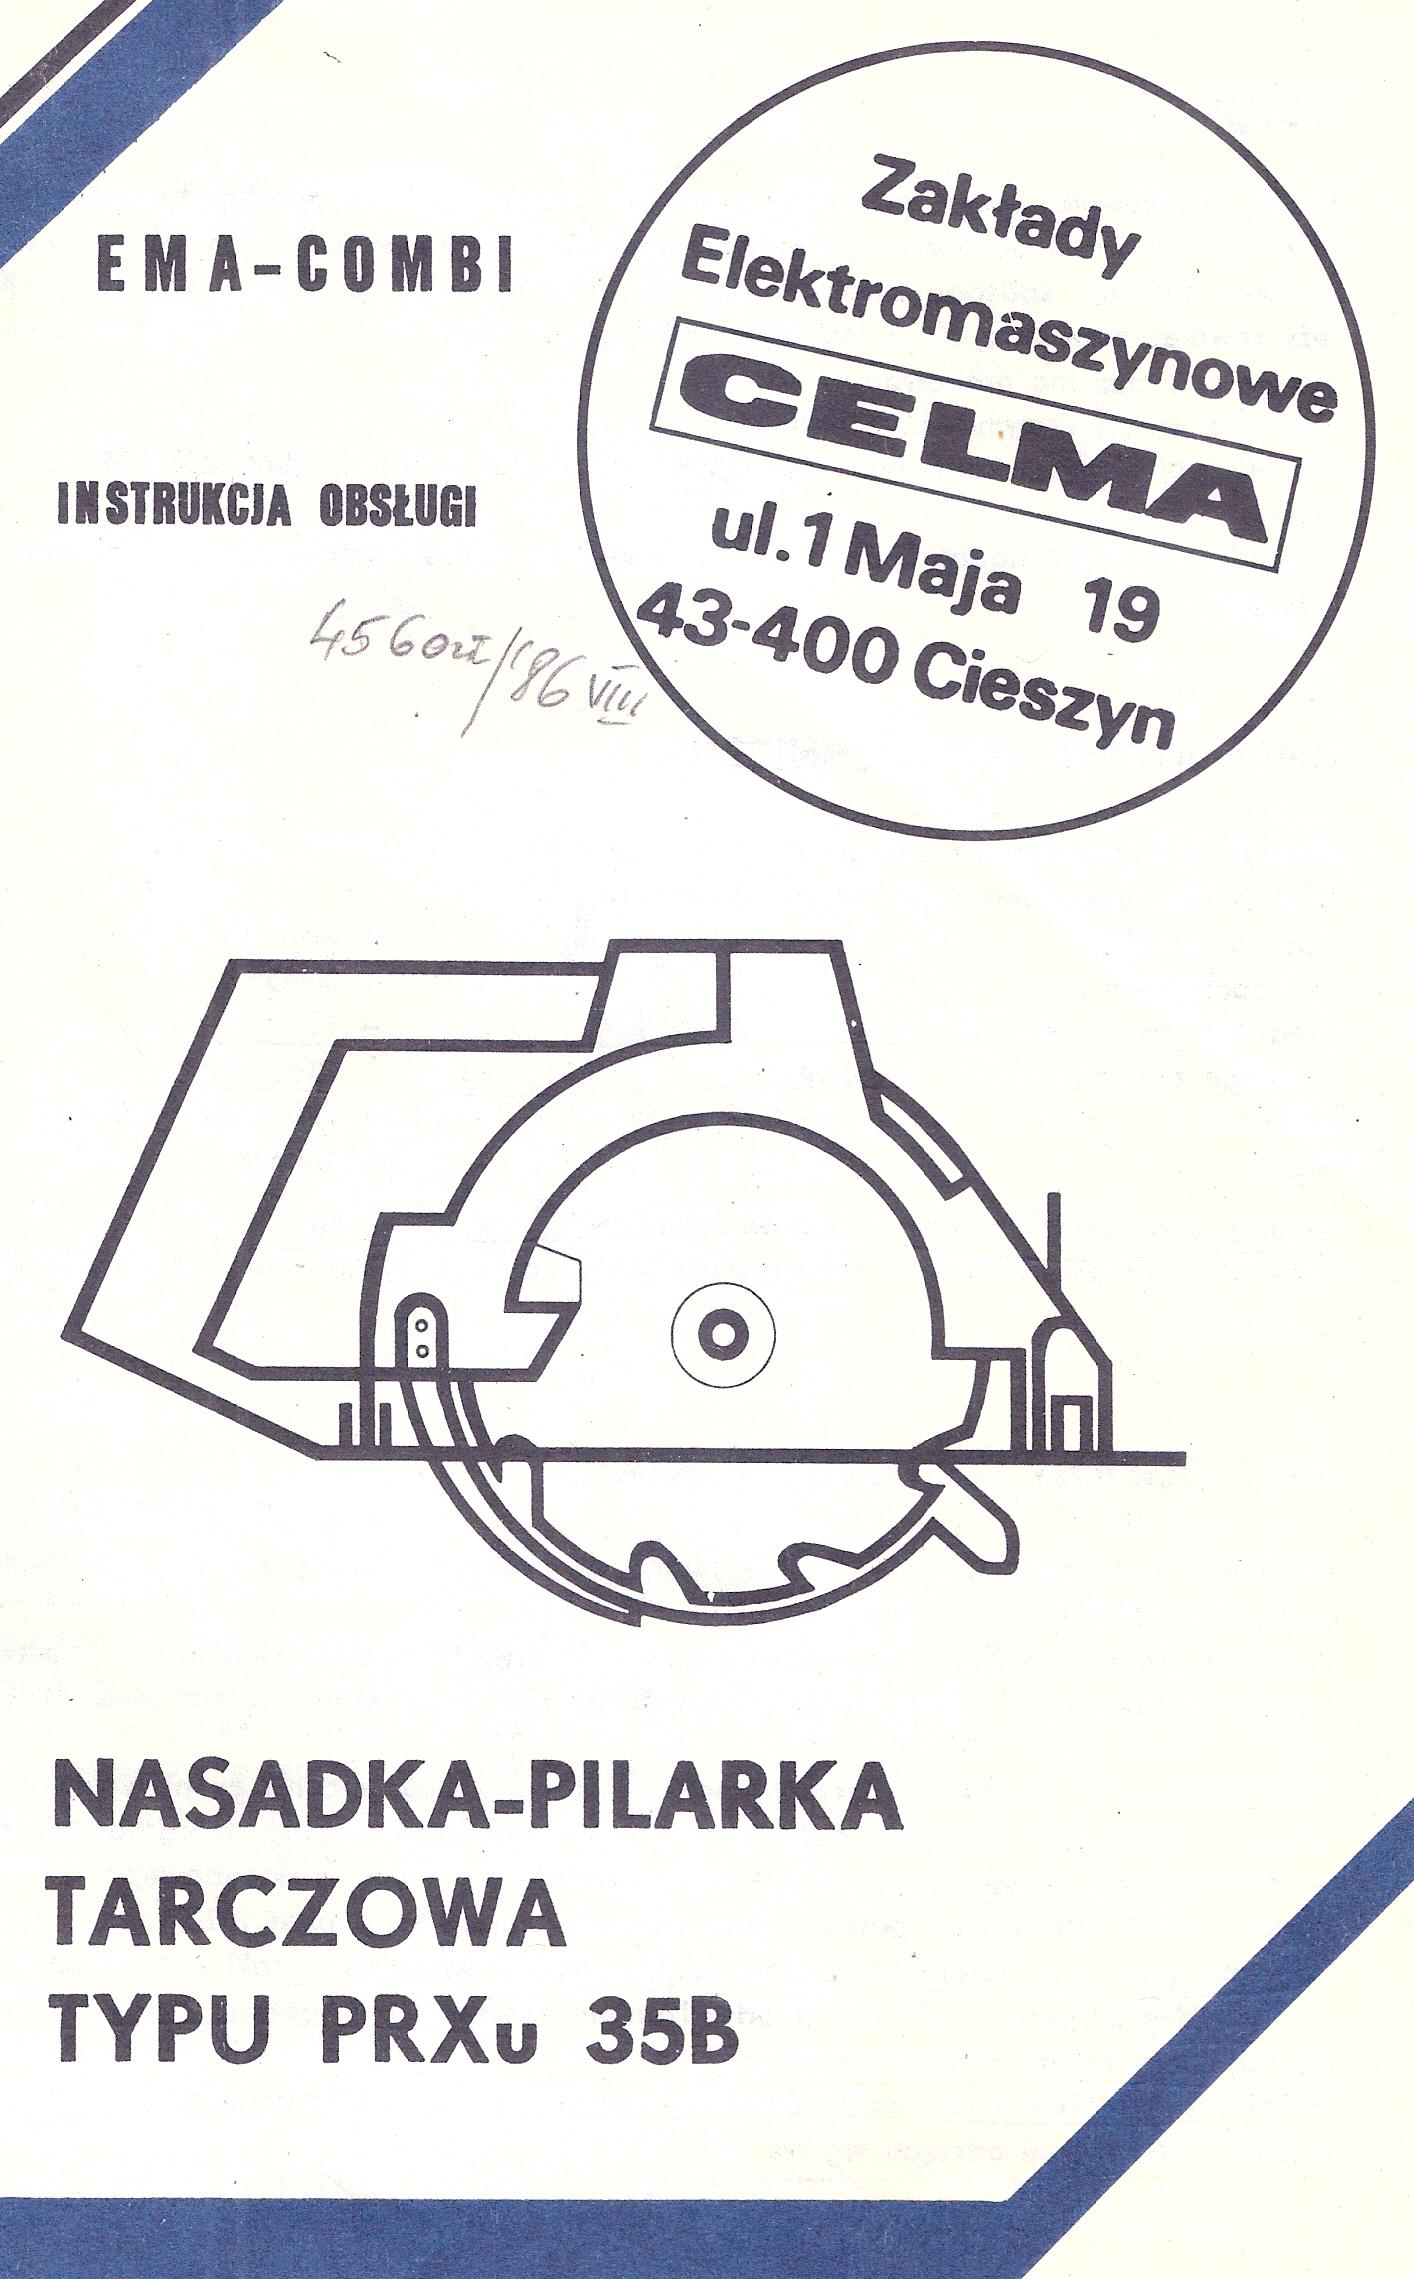 Instrukcja obs�ugi i katalog cz�ci pilarka tarczowa nasadka CELMA PRXu 35B